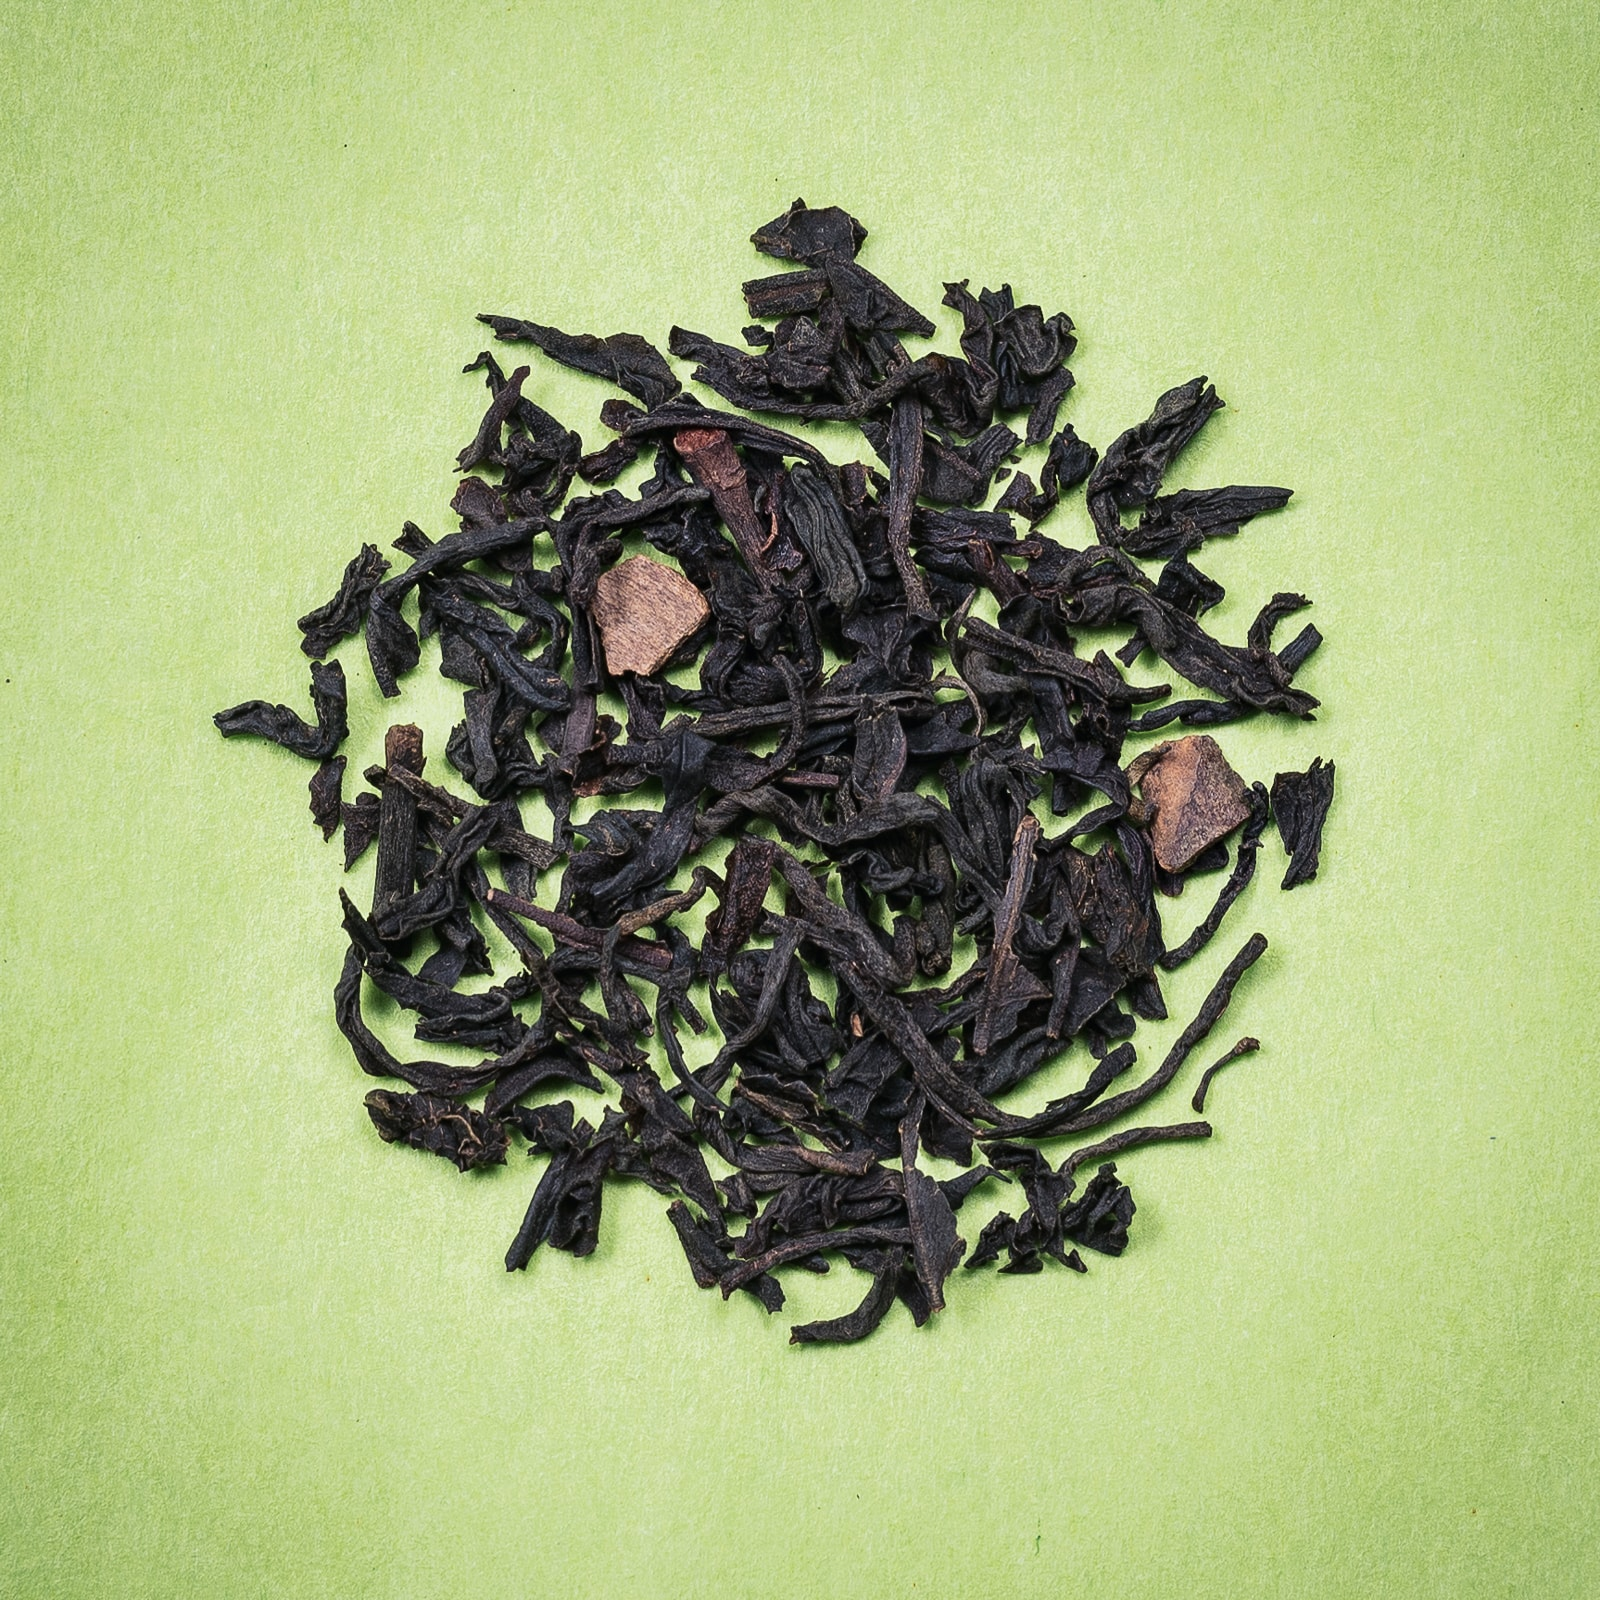 Anbassa-artisan-torrefacteur-the-noir-aromatise-Fetes-Alsaciennes-GUP